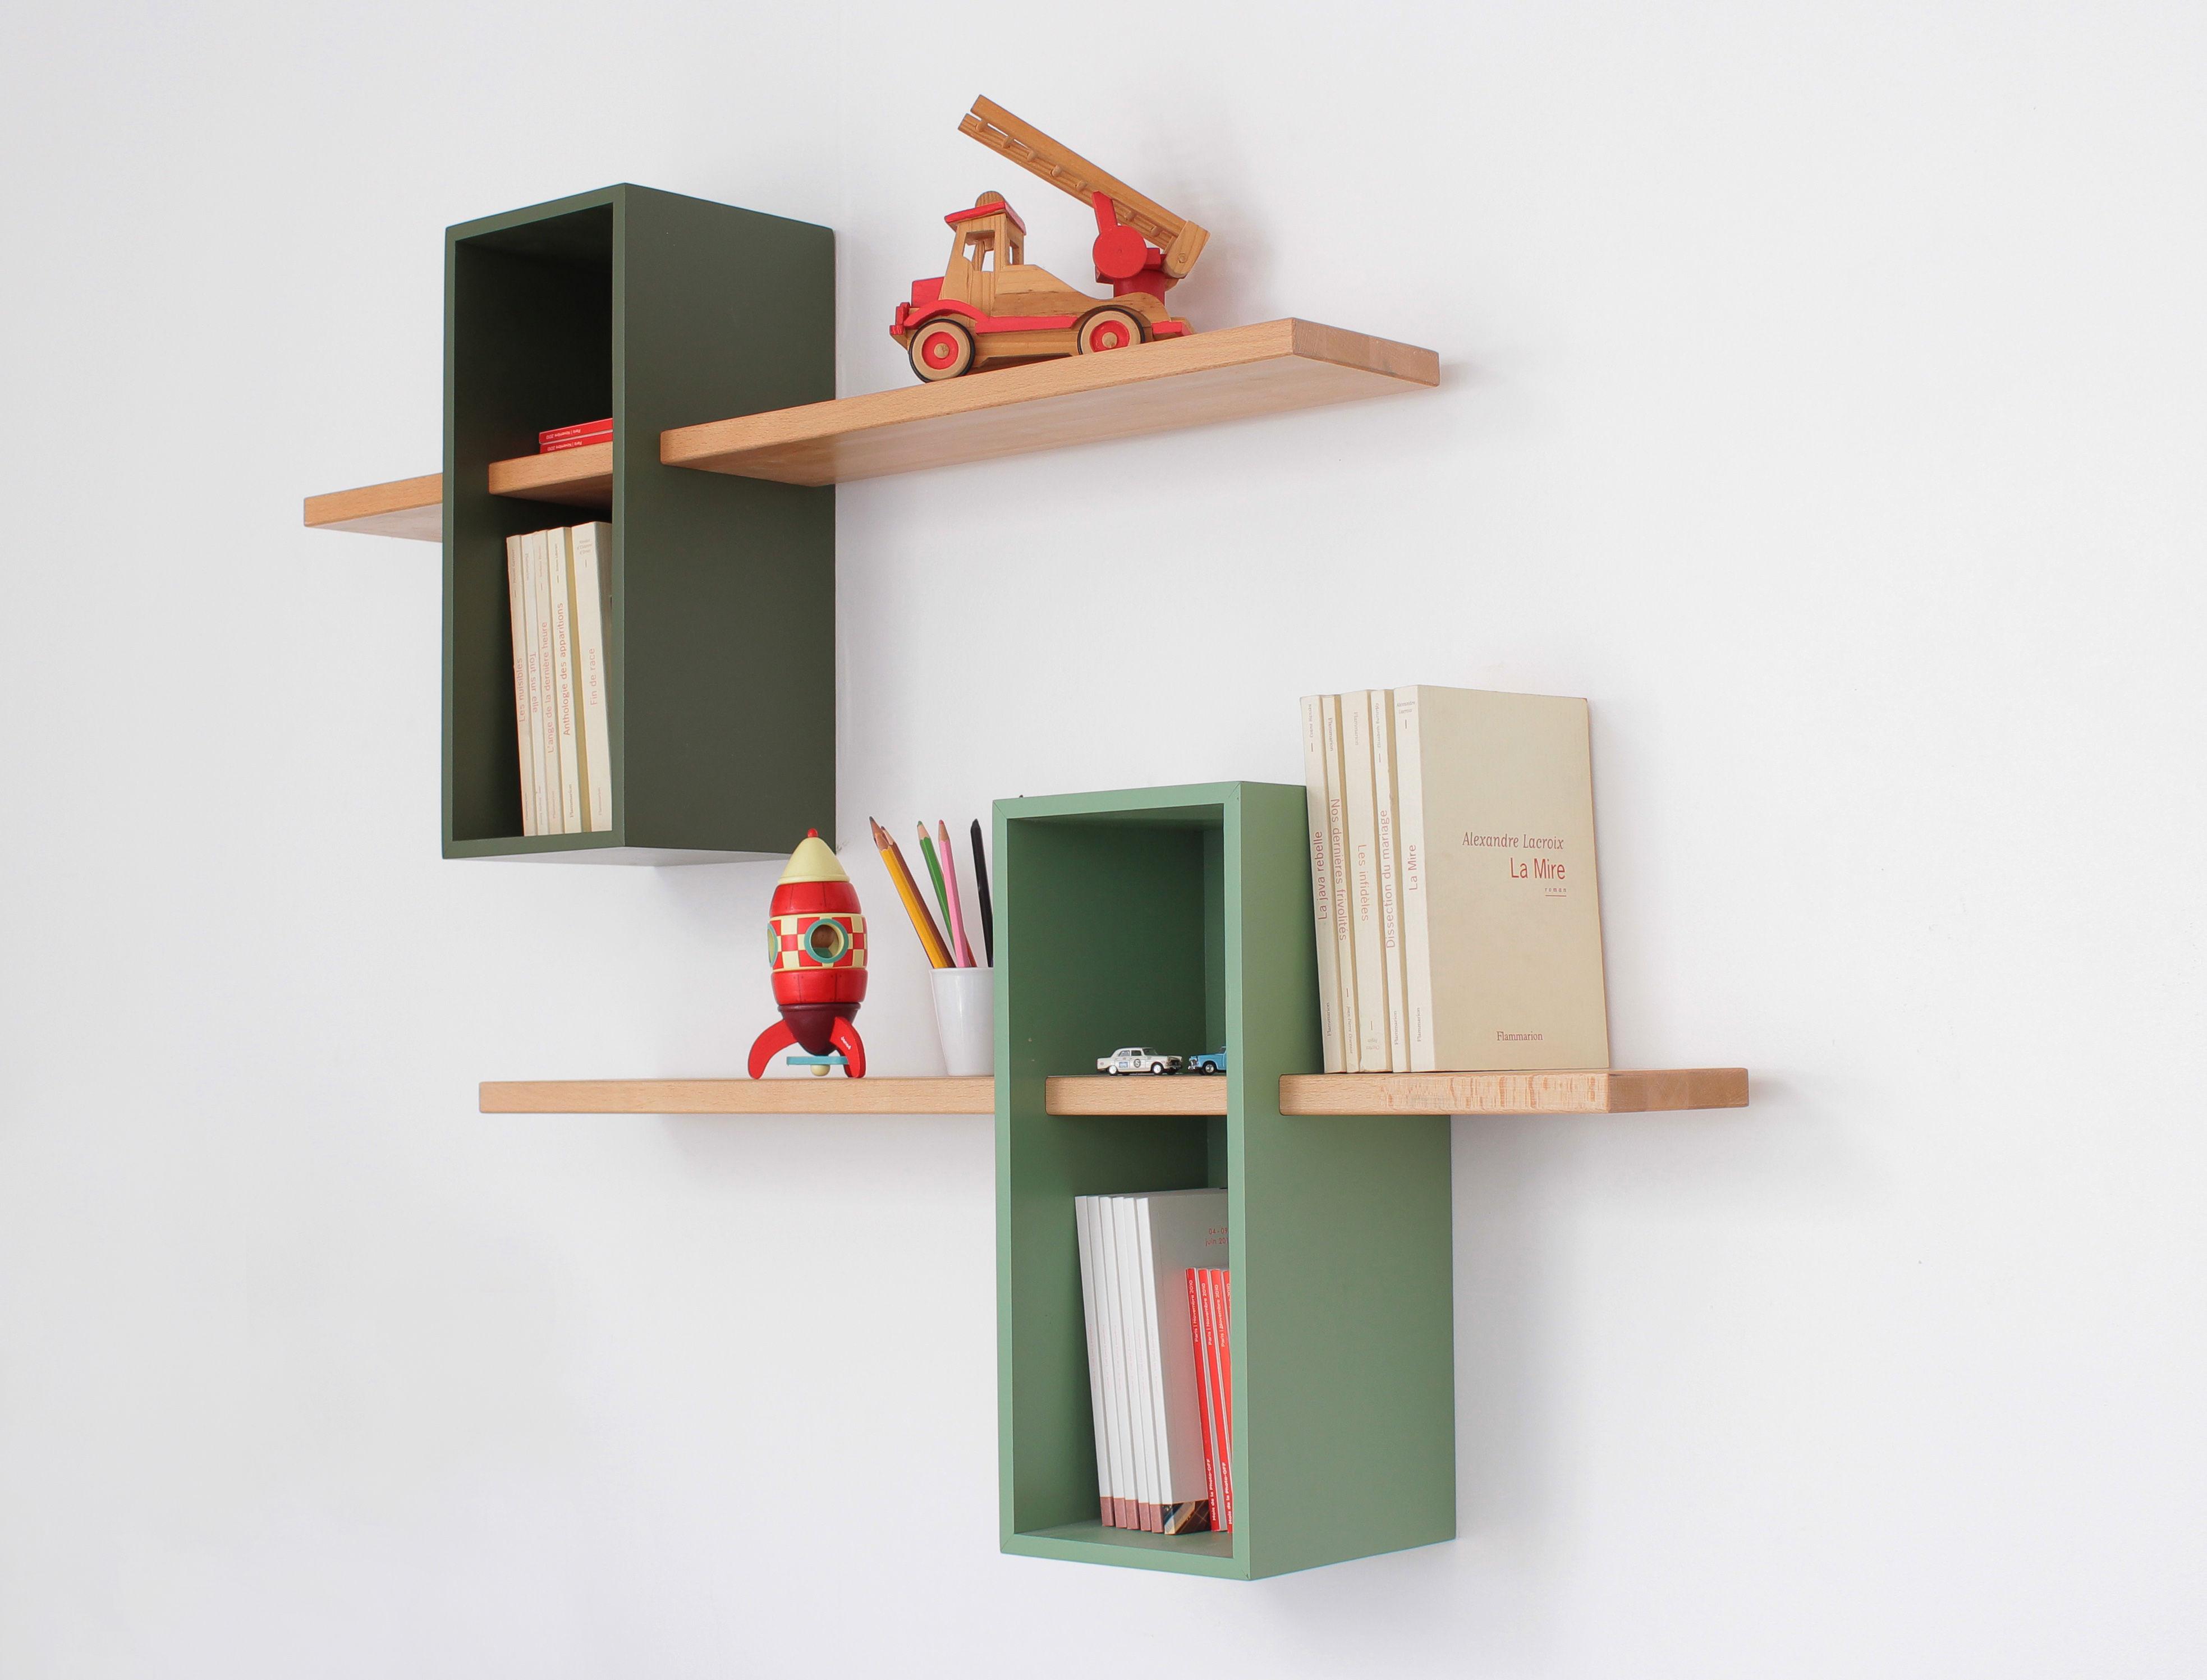 etag re max xl simple 2 caissons 2 tag res vert. Black Bedroom Furniture Sets. Home Design Ideas